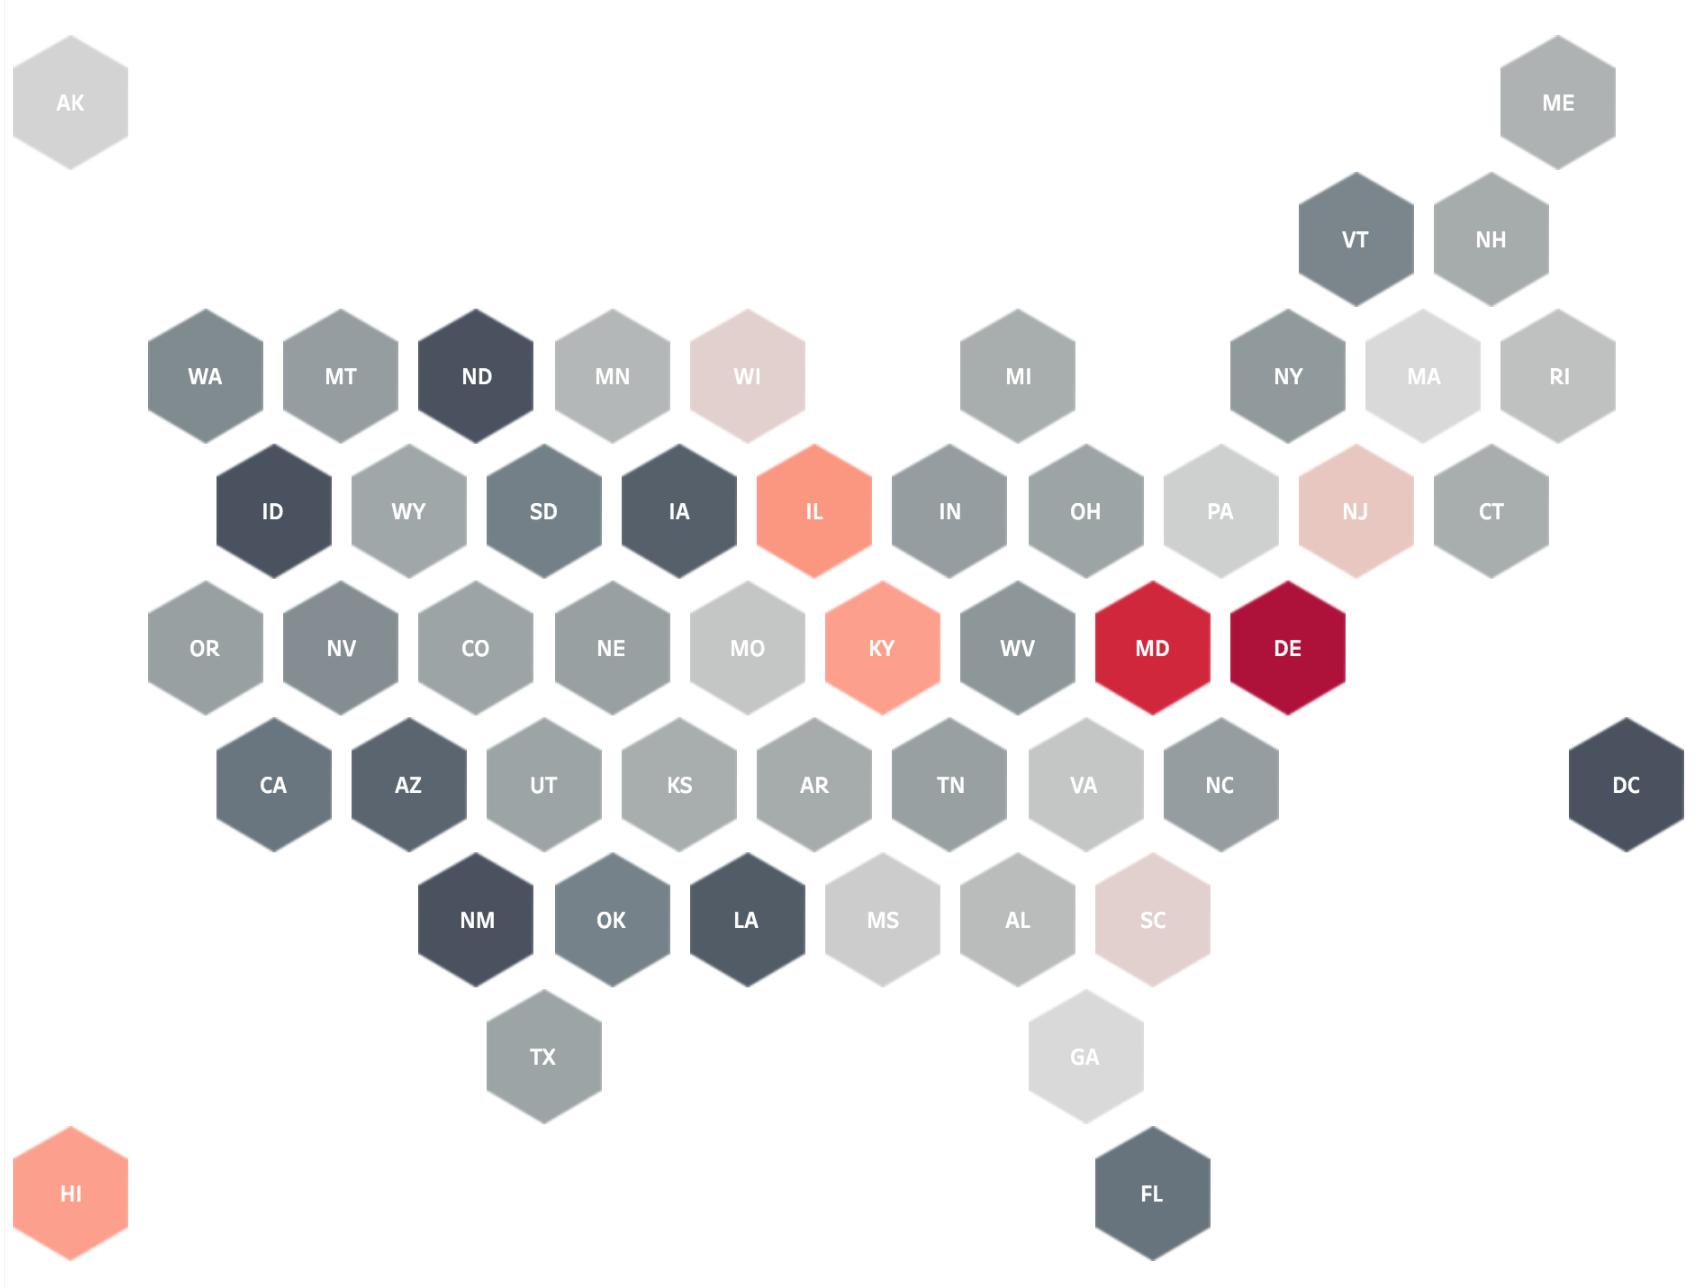 Hex Tile Maps Help Eliminate The Alaska Effect